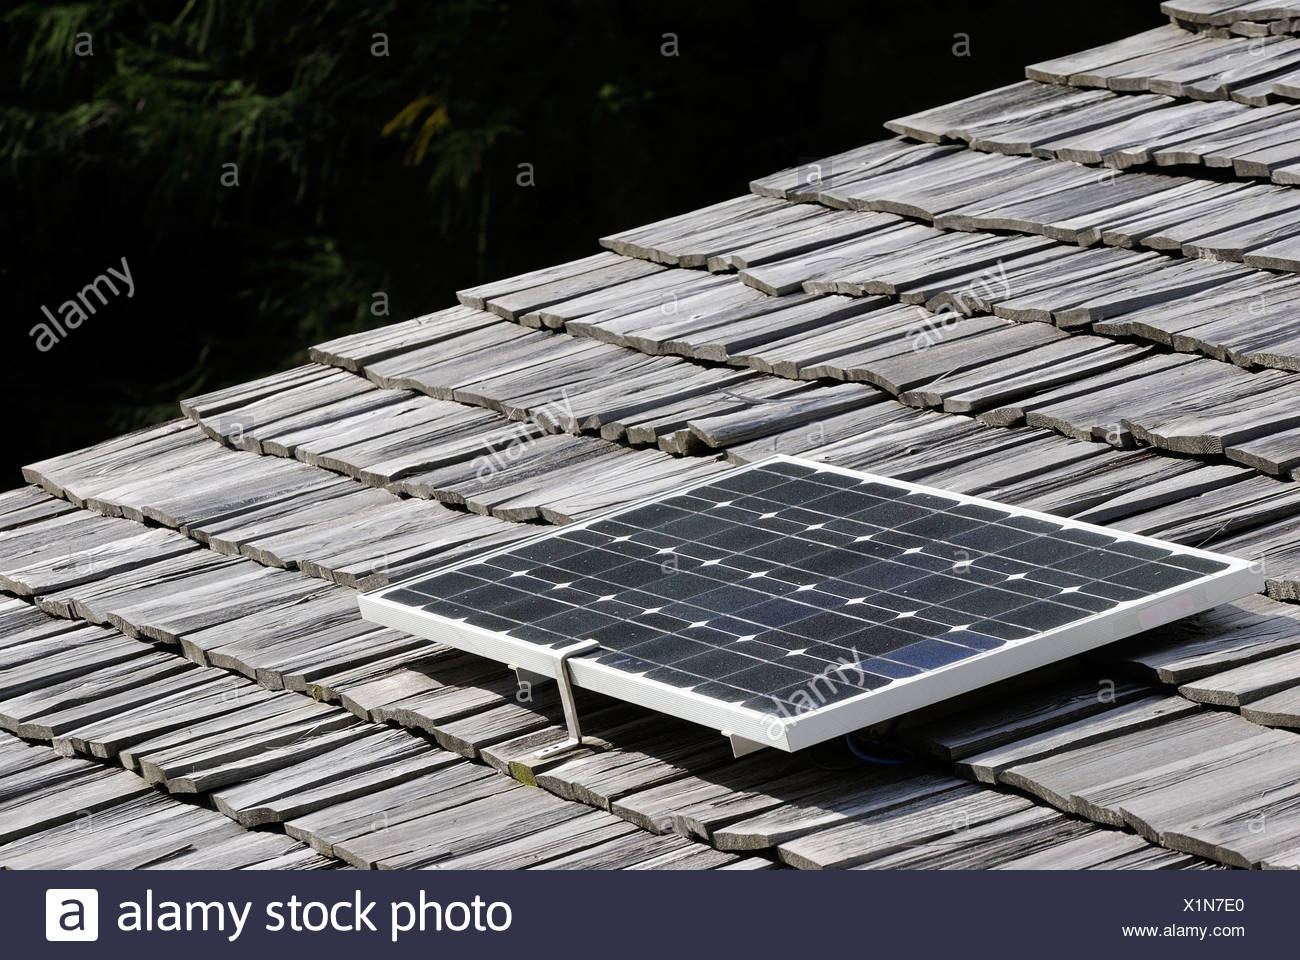 Europe, Austria, Solar panel on roof top - Stock Image